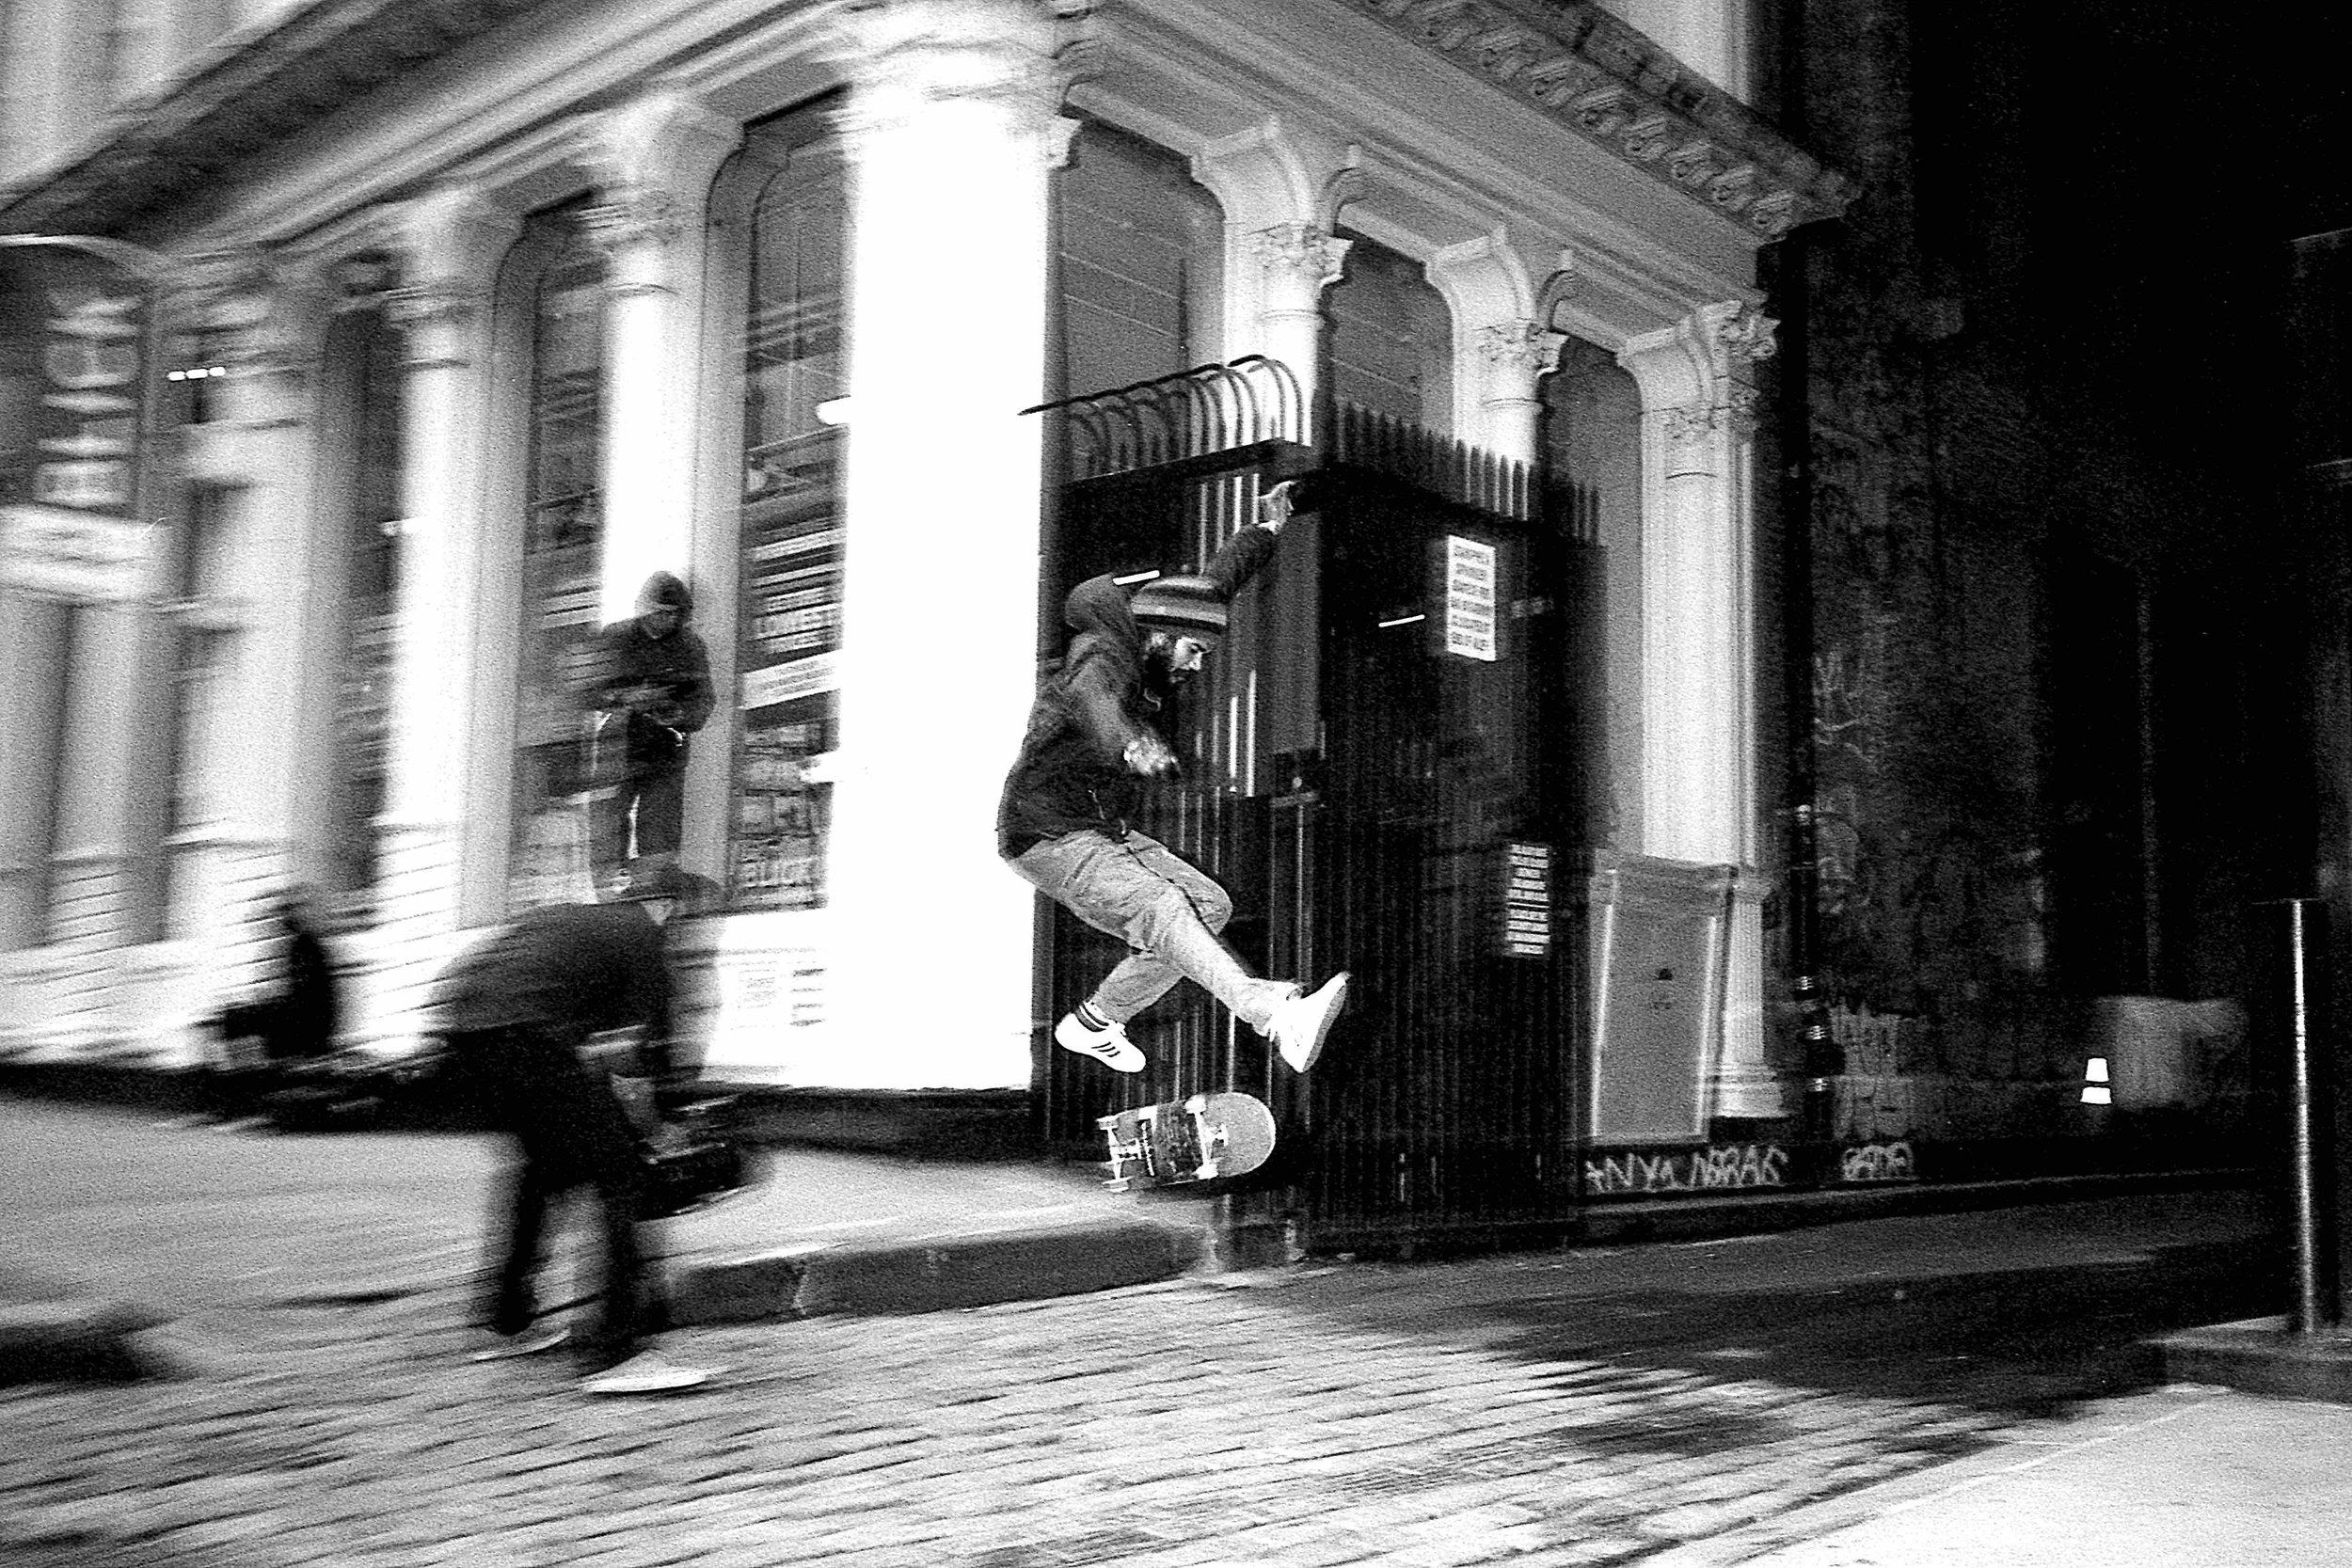 Matt Pittman / Leica M7 / Ilford HP5 / New York City / Skateboarding